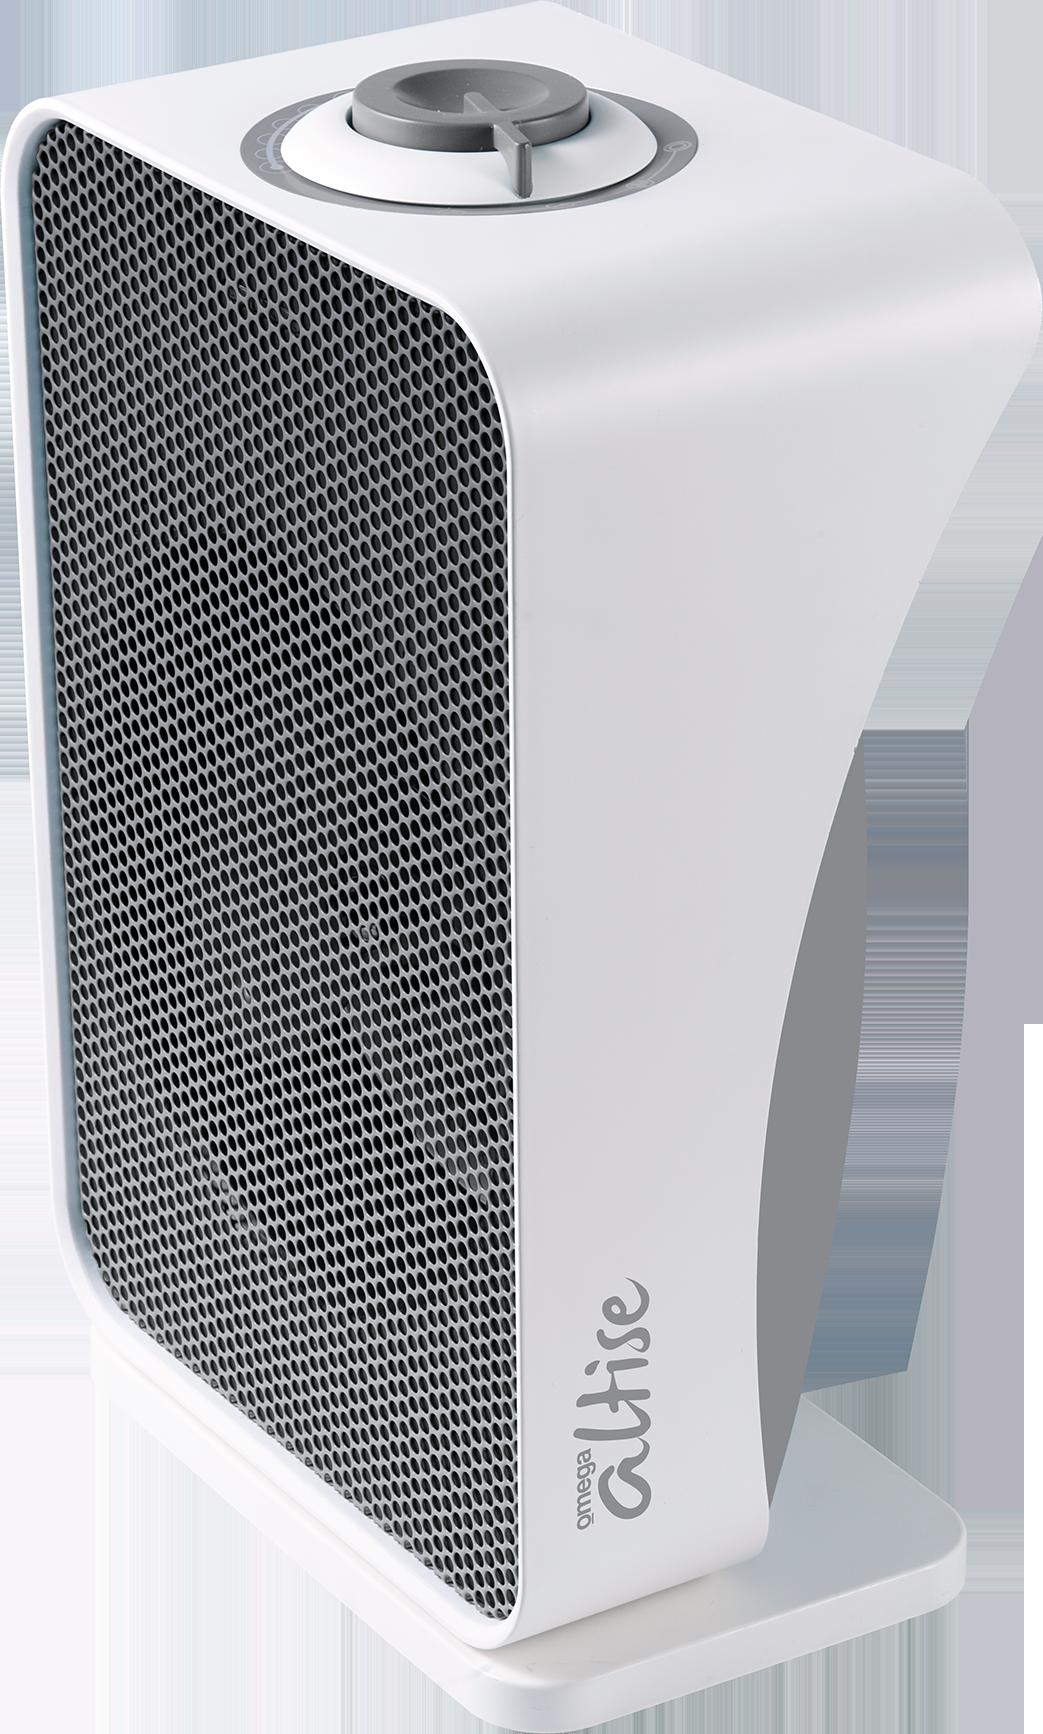 Omega Altise Product Portable Fan Heater - White2000W(OAFH2000W)